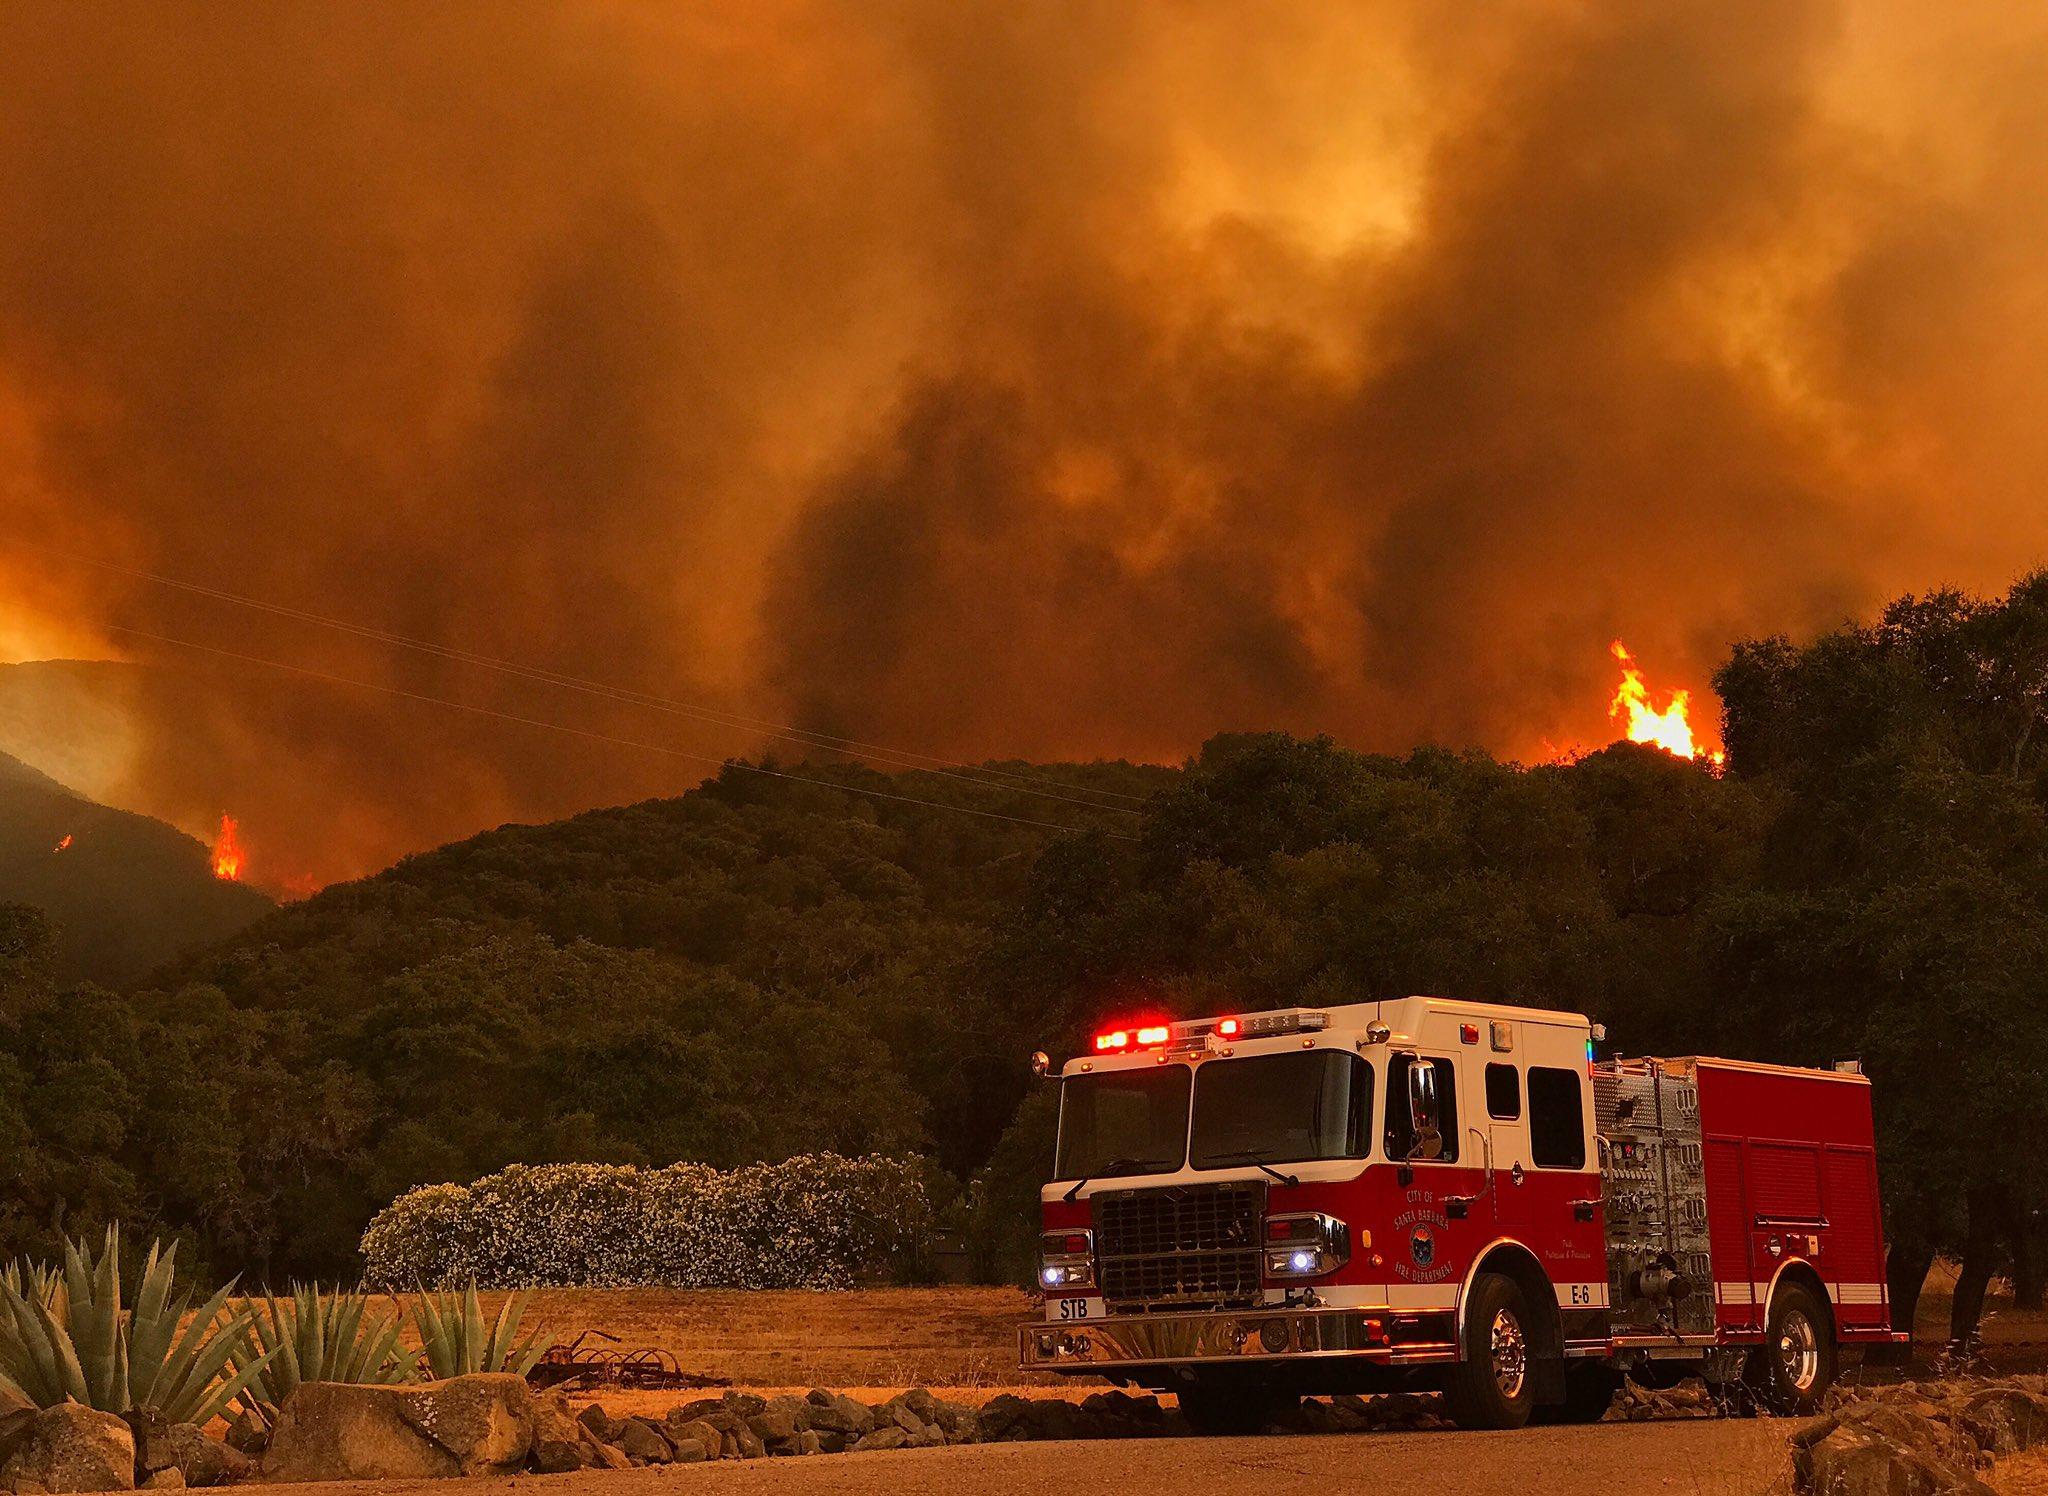 Photo courtesy Mike Eliason/Santa Barbara Co. Fire Dept.